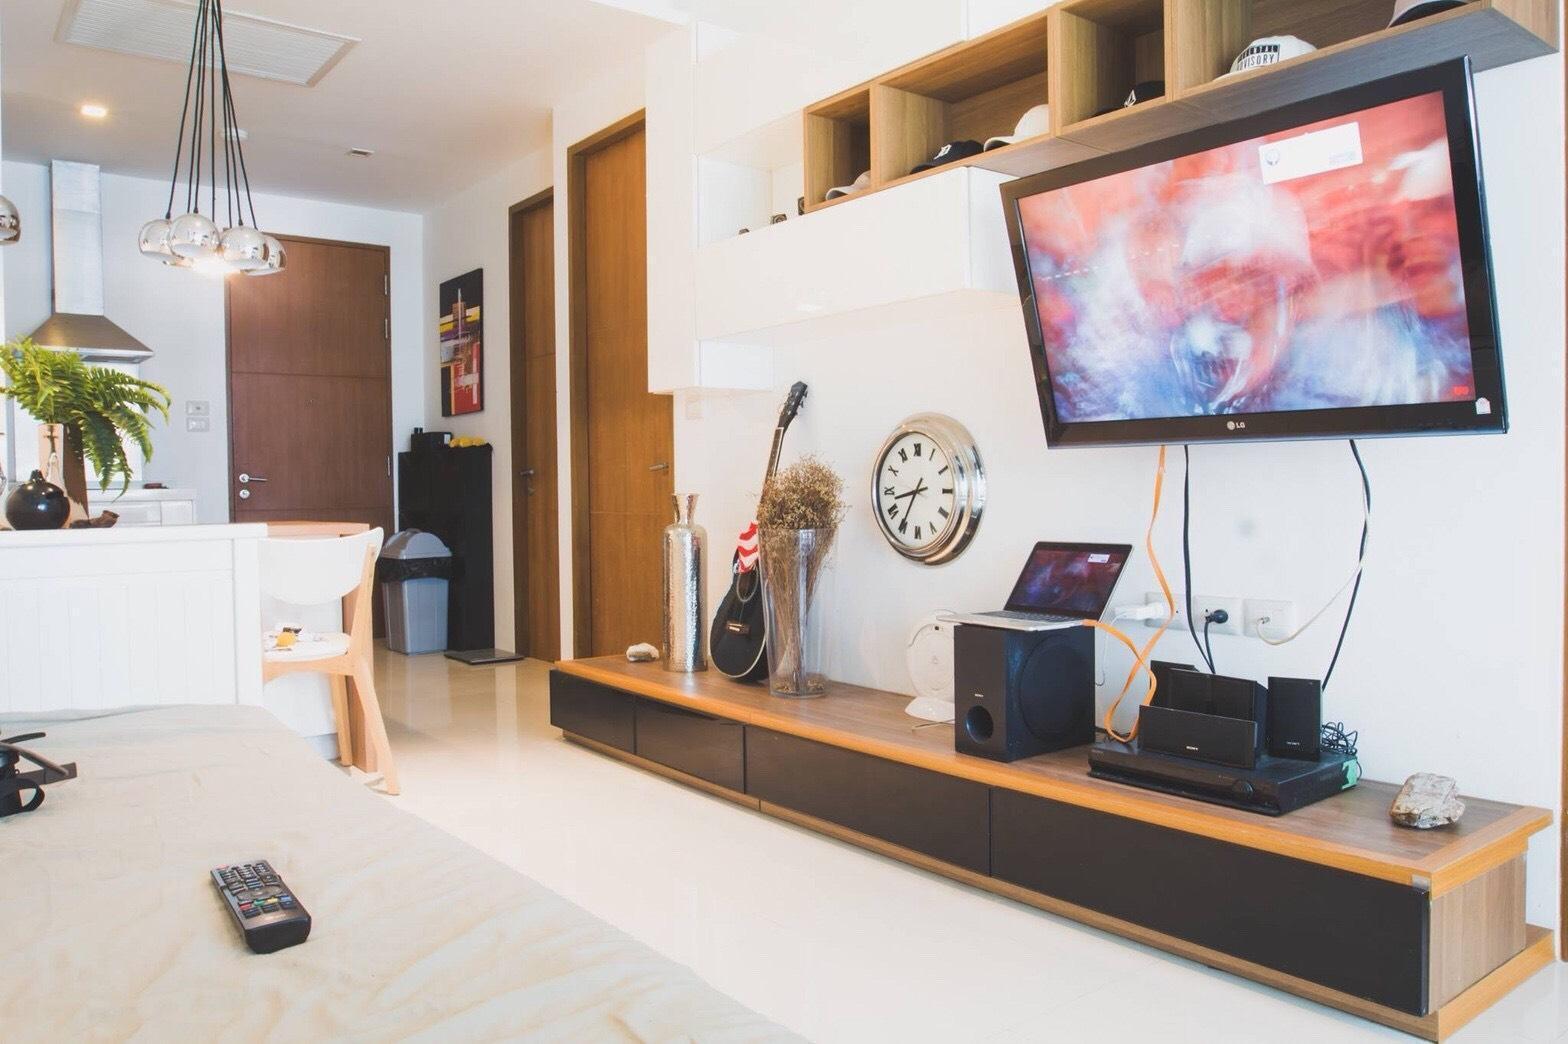 The Sanctuary Wongamat Condominium อพาร์ตเมนต์ 2 ห้องนอน 2 ห้องน้ำส่วนตัว ขนาด 61 ตร.ม. – นาเกลือ/บางละมุง